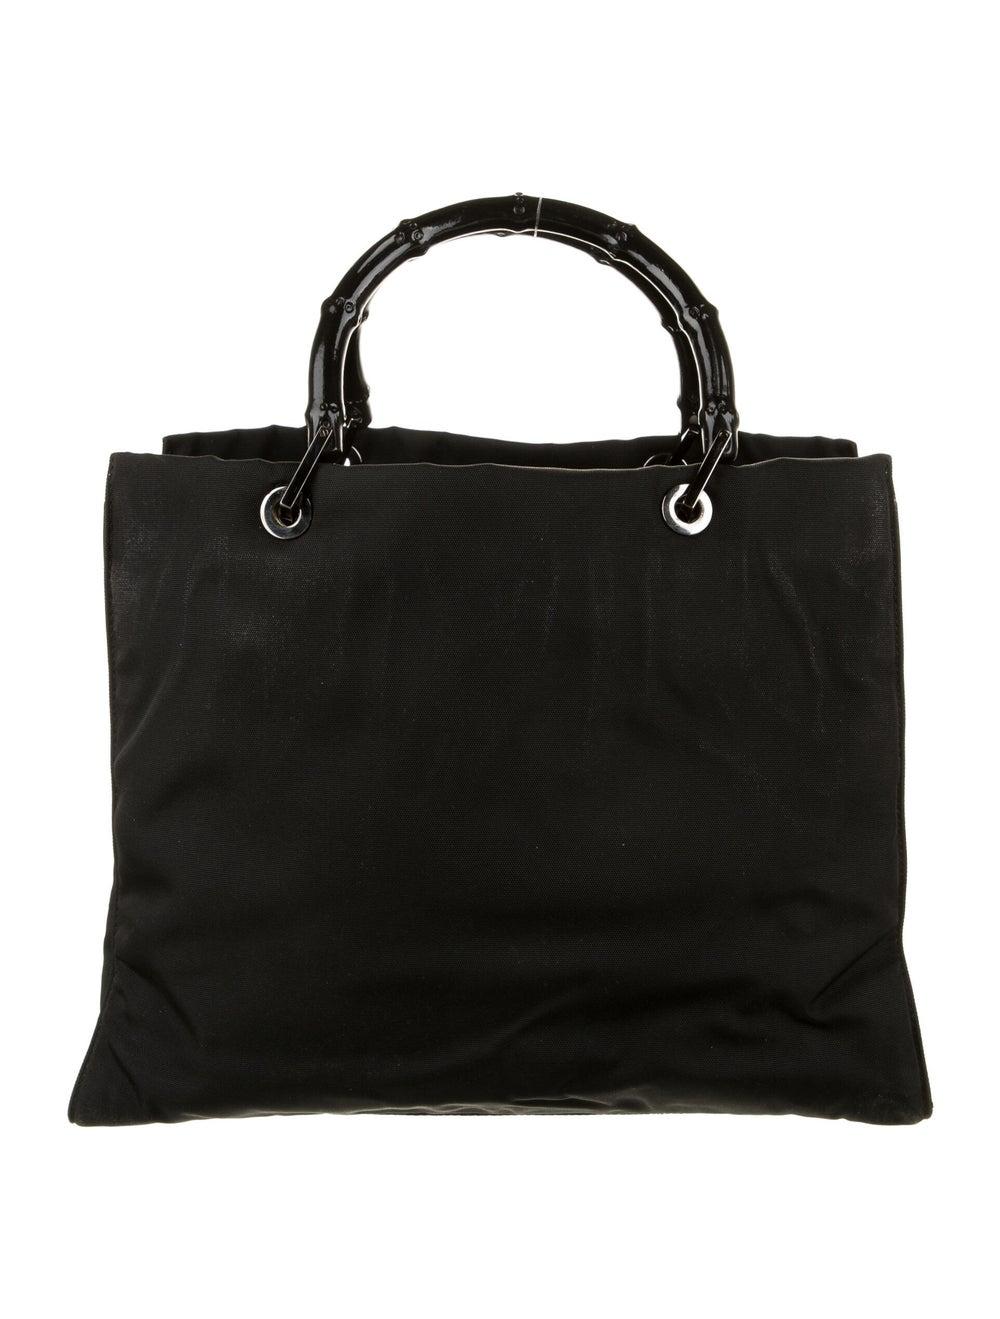 Gucci Nylon Bamboo Top Handle Bag Black - image 4